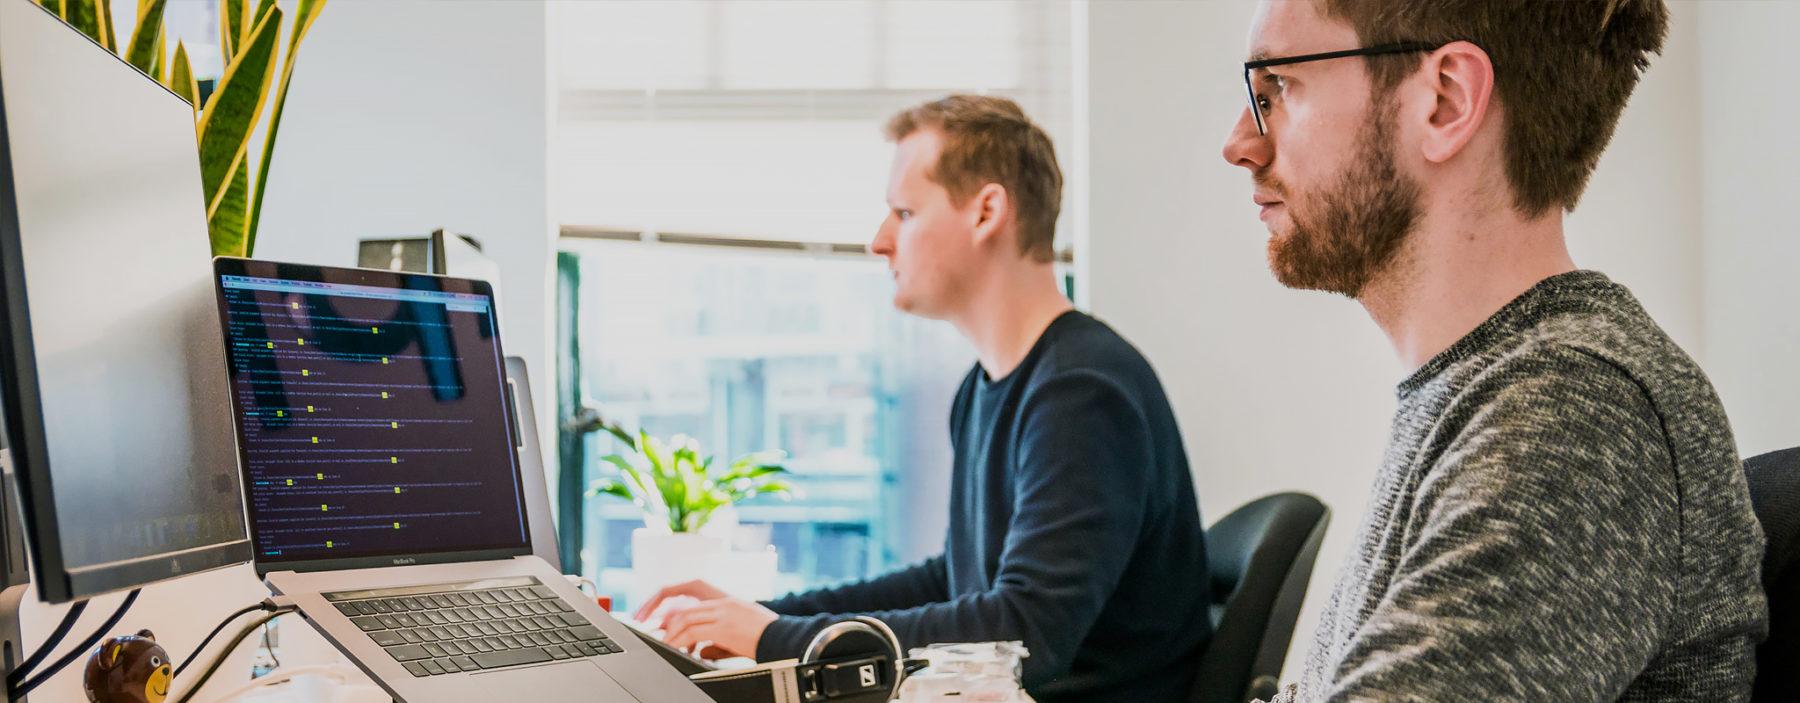 Digital development and design solutions team